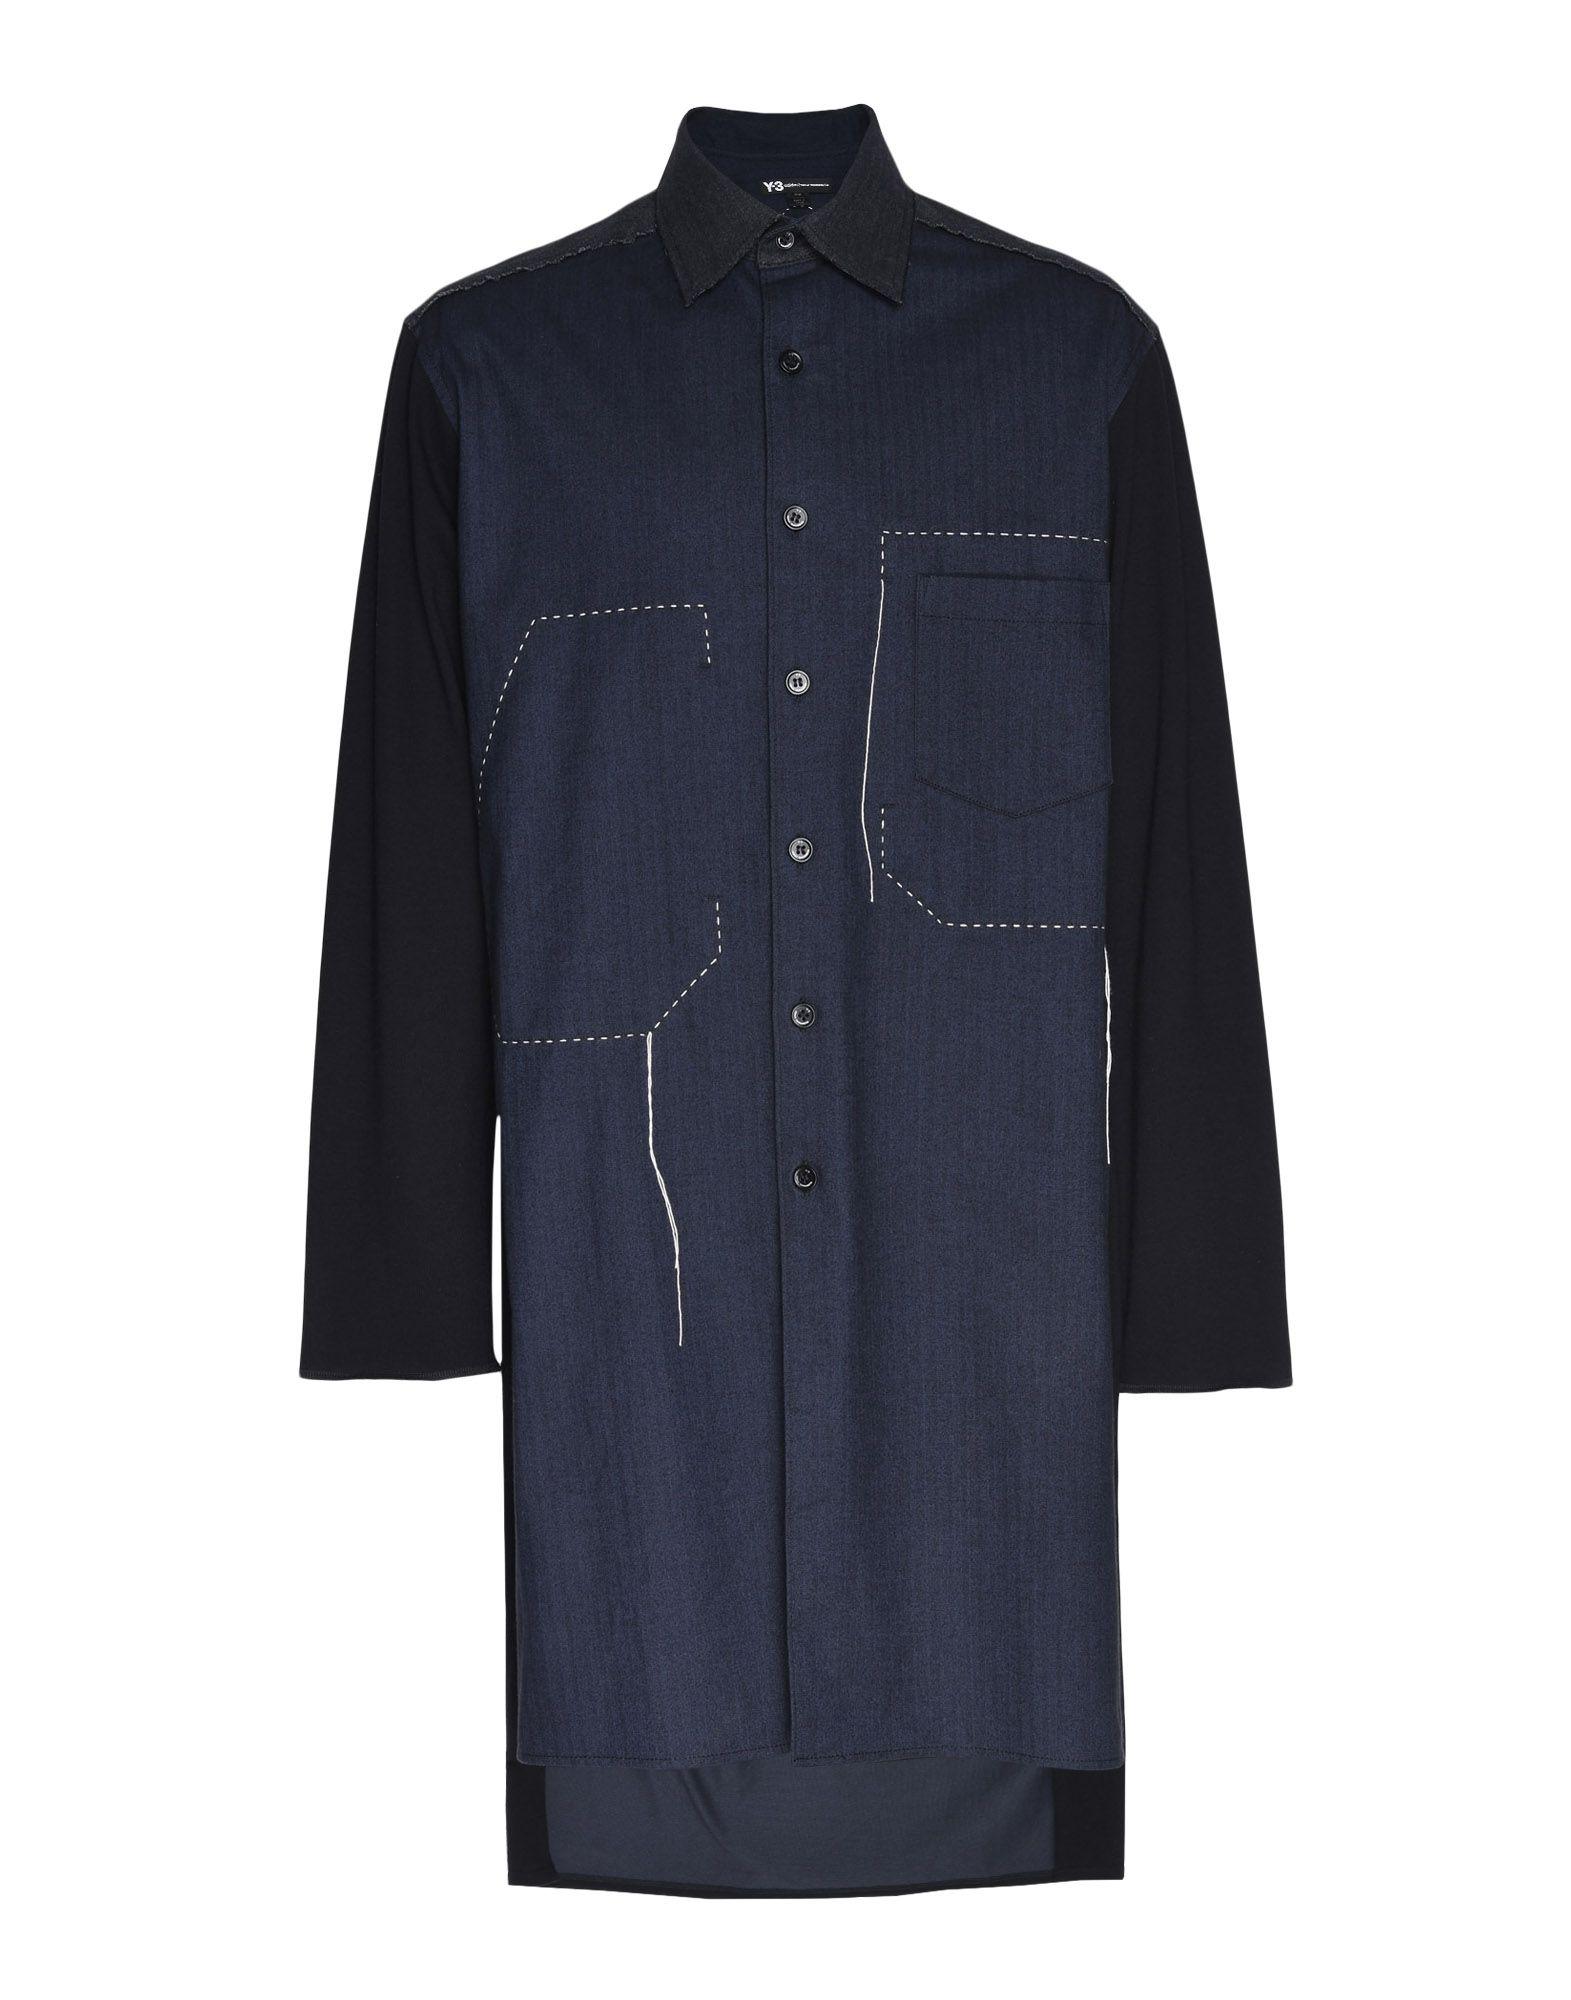 Y-3 Y-3 Herringbone Long Shirt Long sleeve shirt Man f